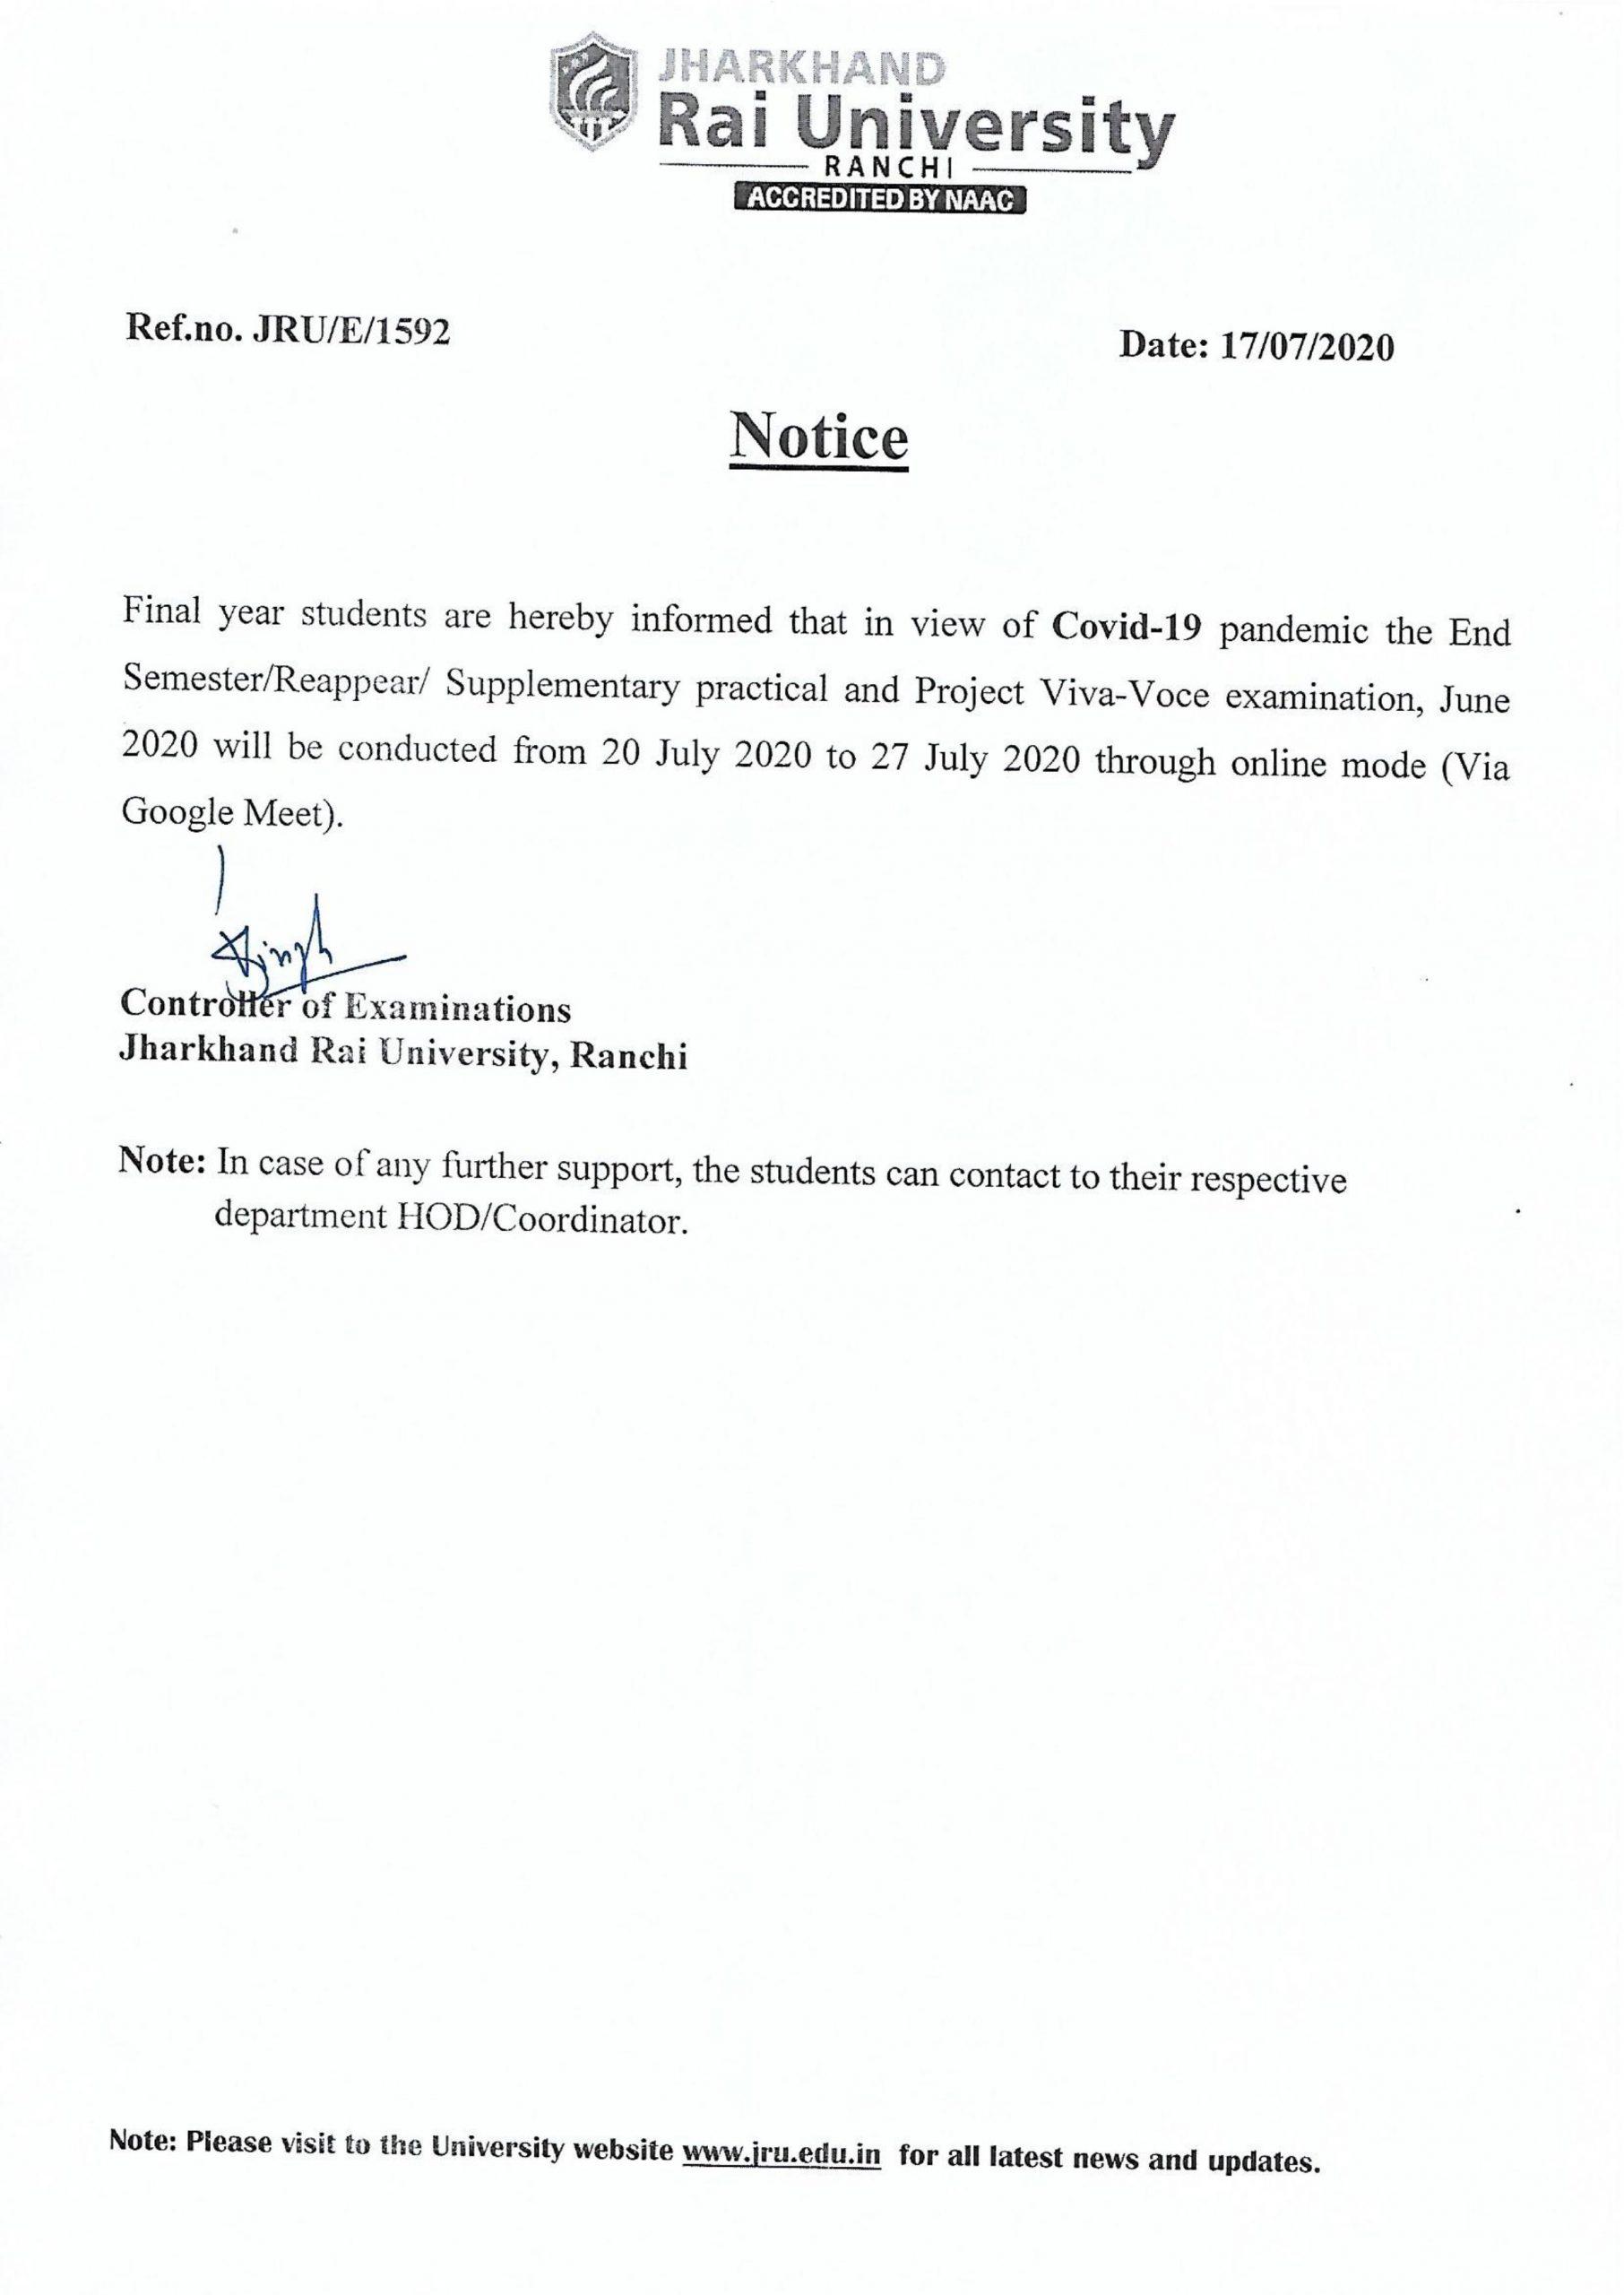 notice regarding End Semester